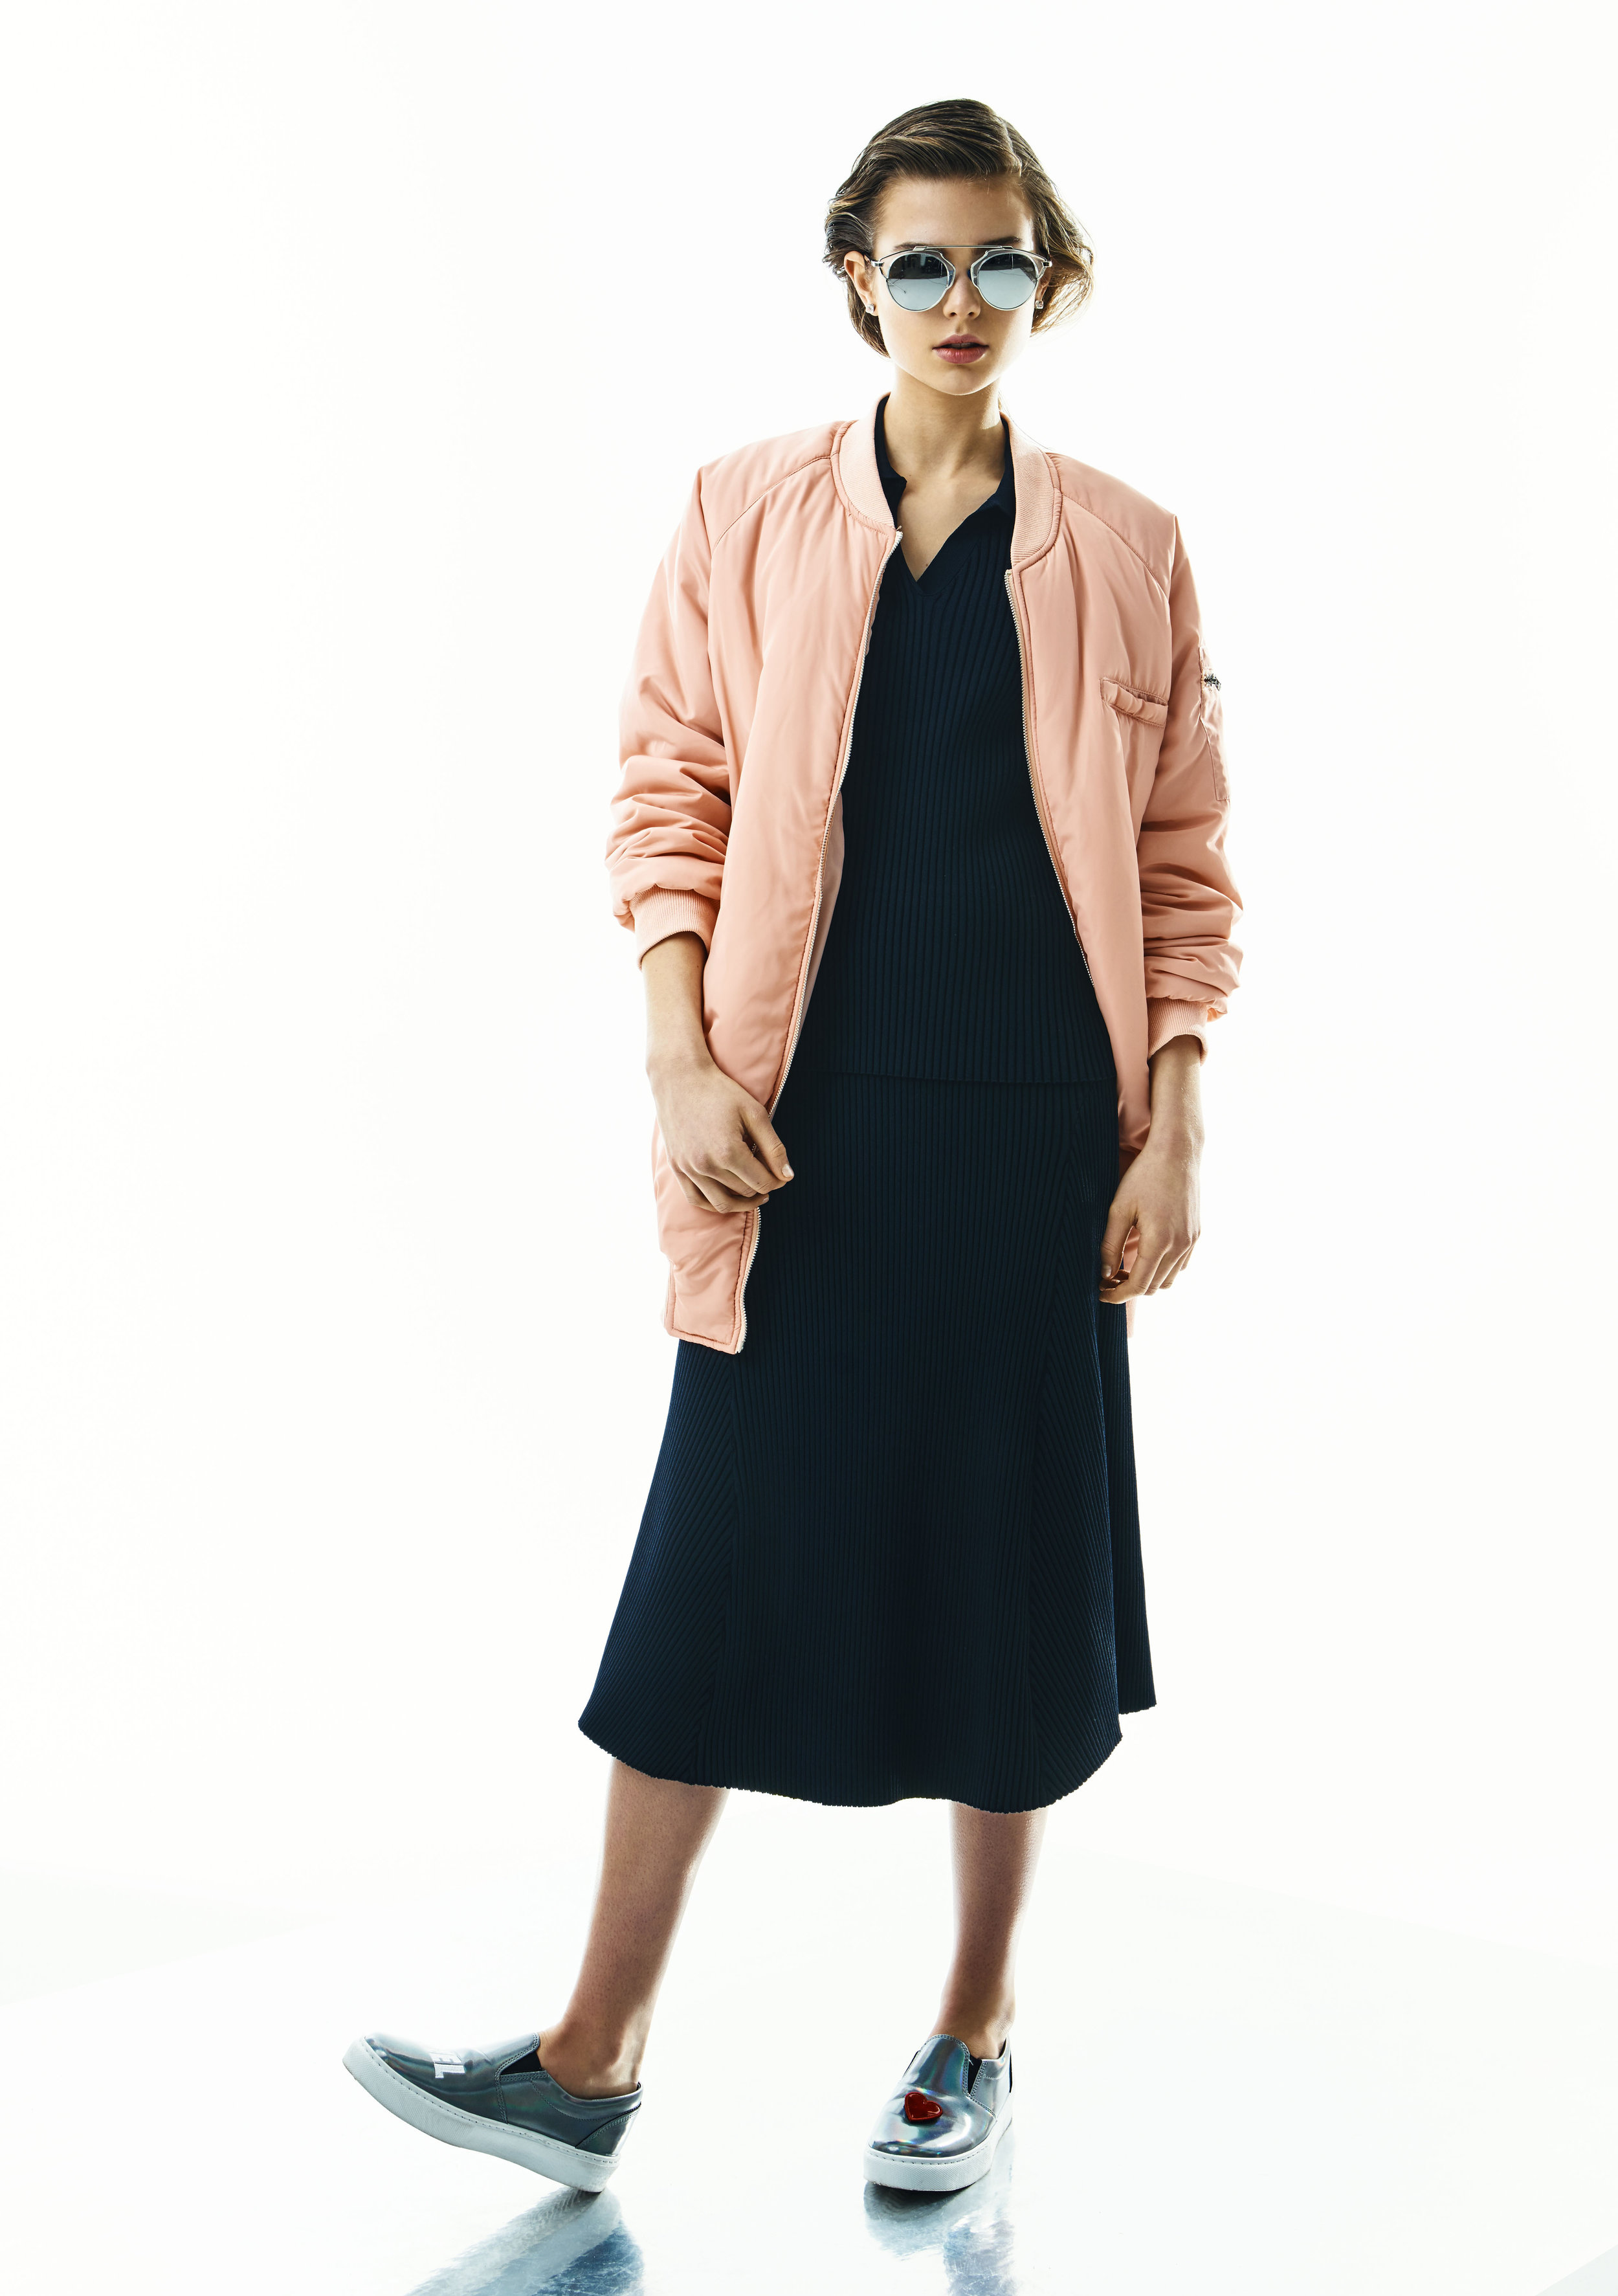 Shirt and skirt, Wood Wood; jacket,Missguided;sunglasses,Dior;shoes,Chiara Ferragni